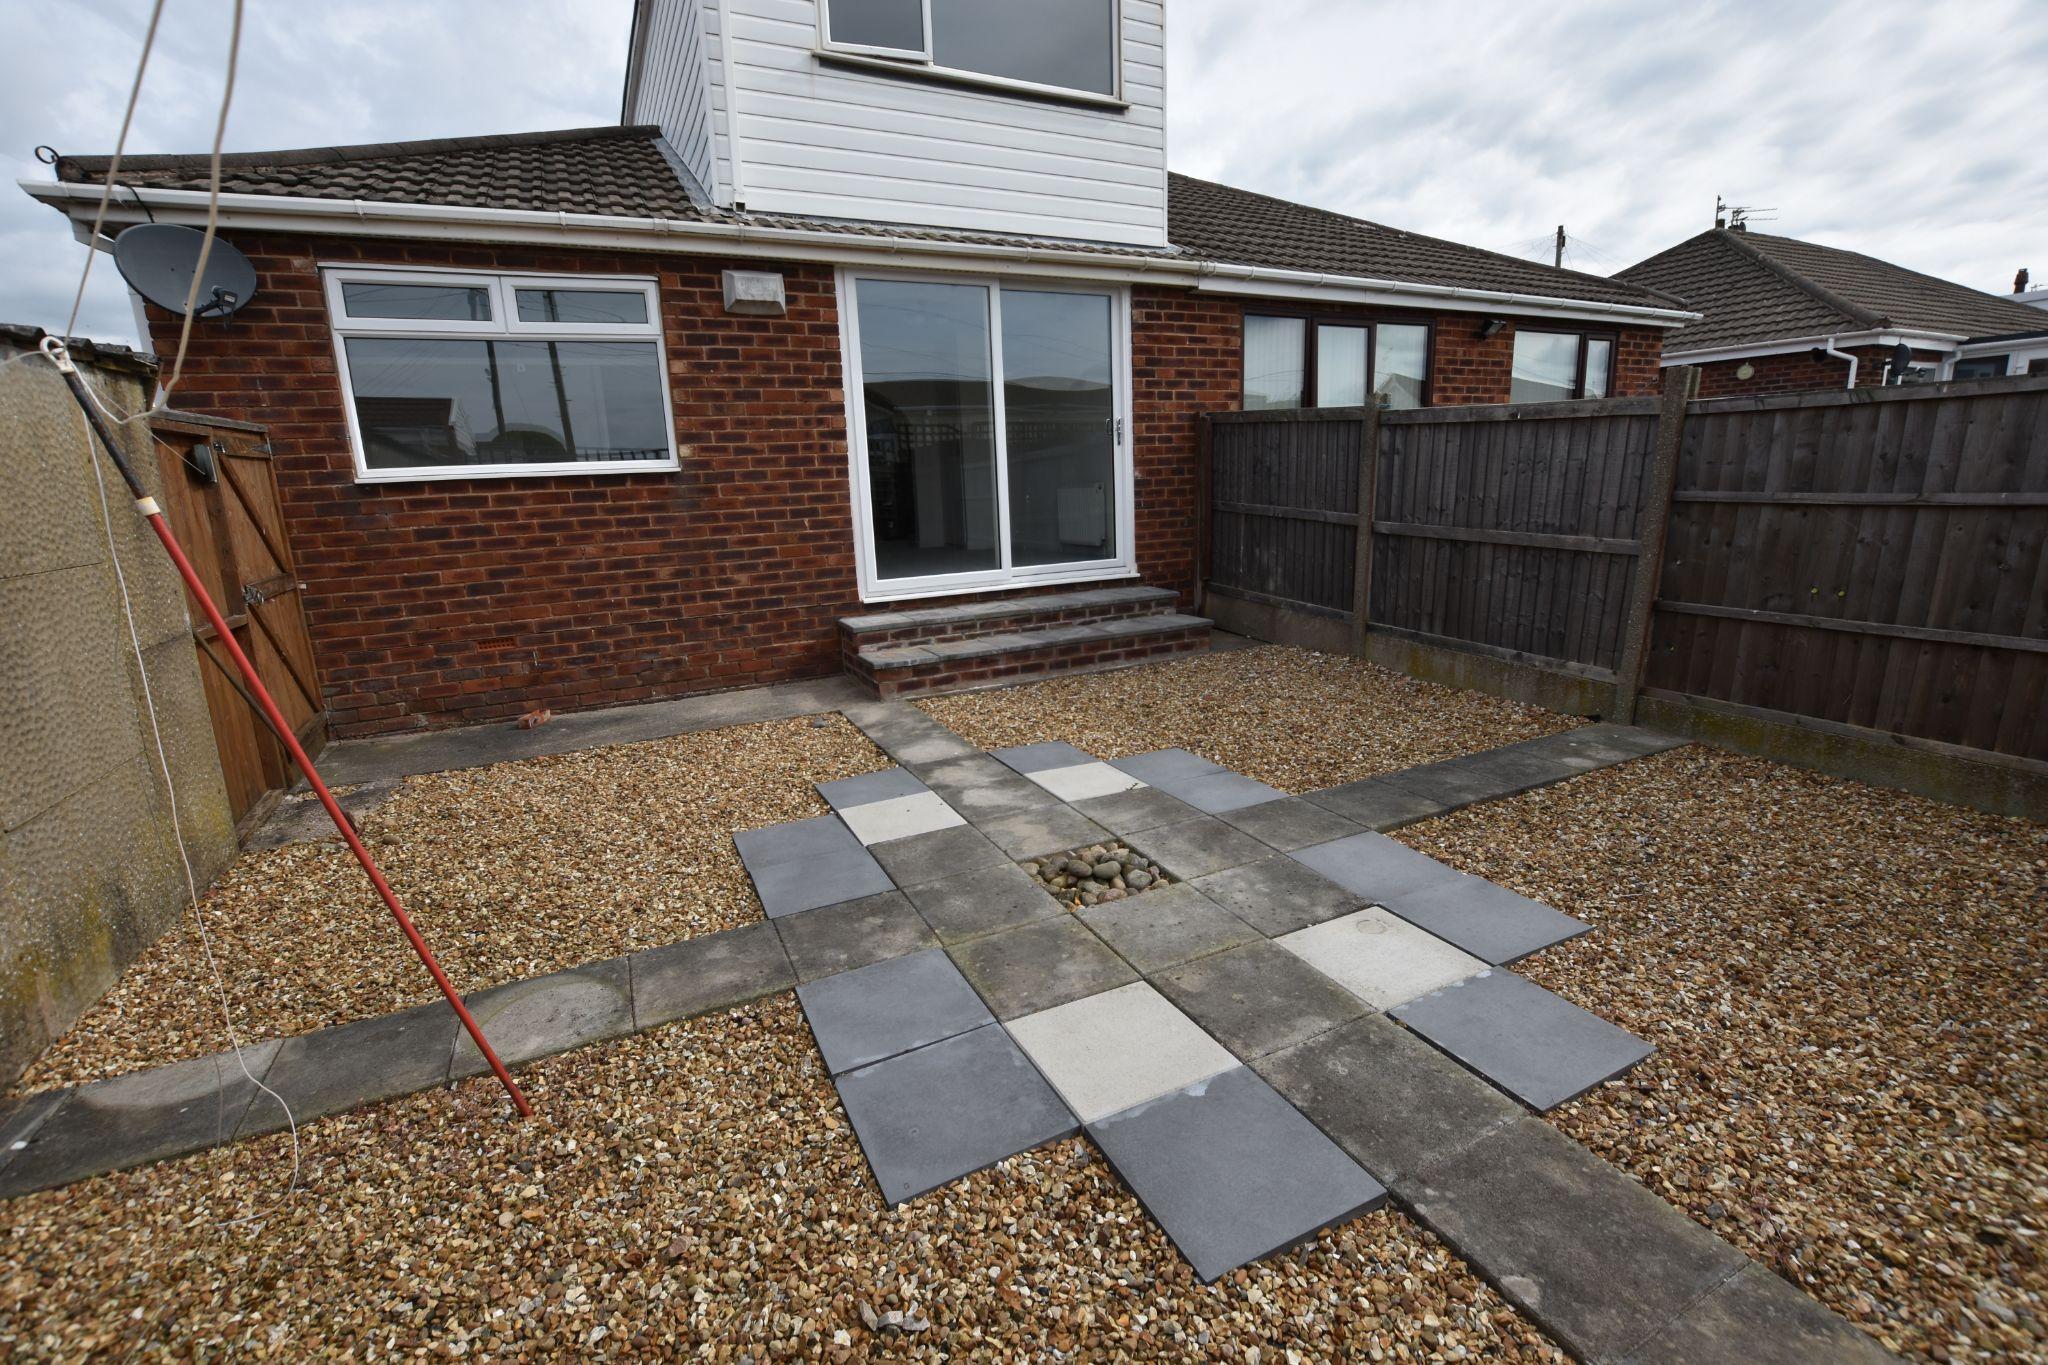 3 bedroom semi-detached bungalow To Let in Preston - Garden